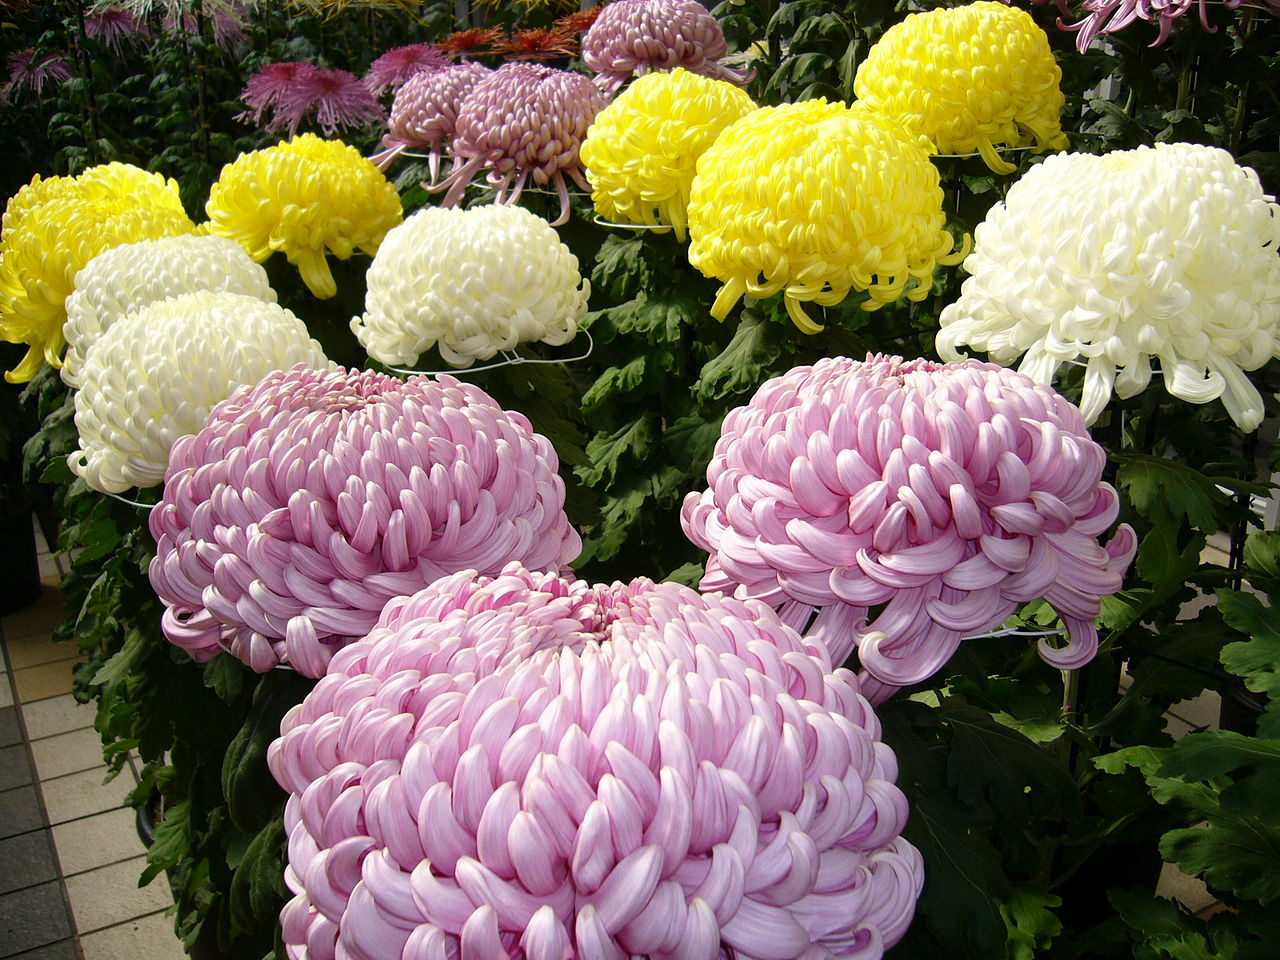 Chrysanthemum National Flower Of Japan Meaning Of The Chrysanthemum